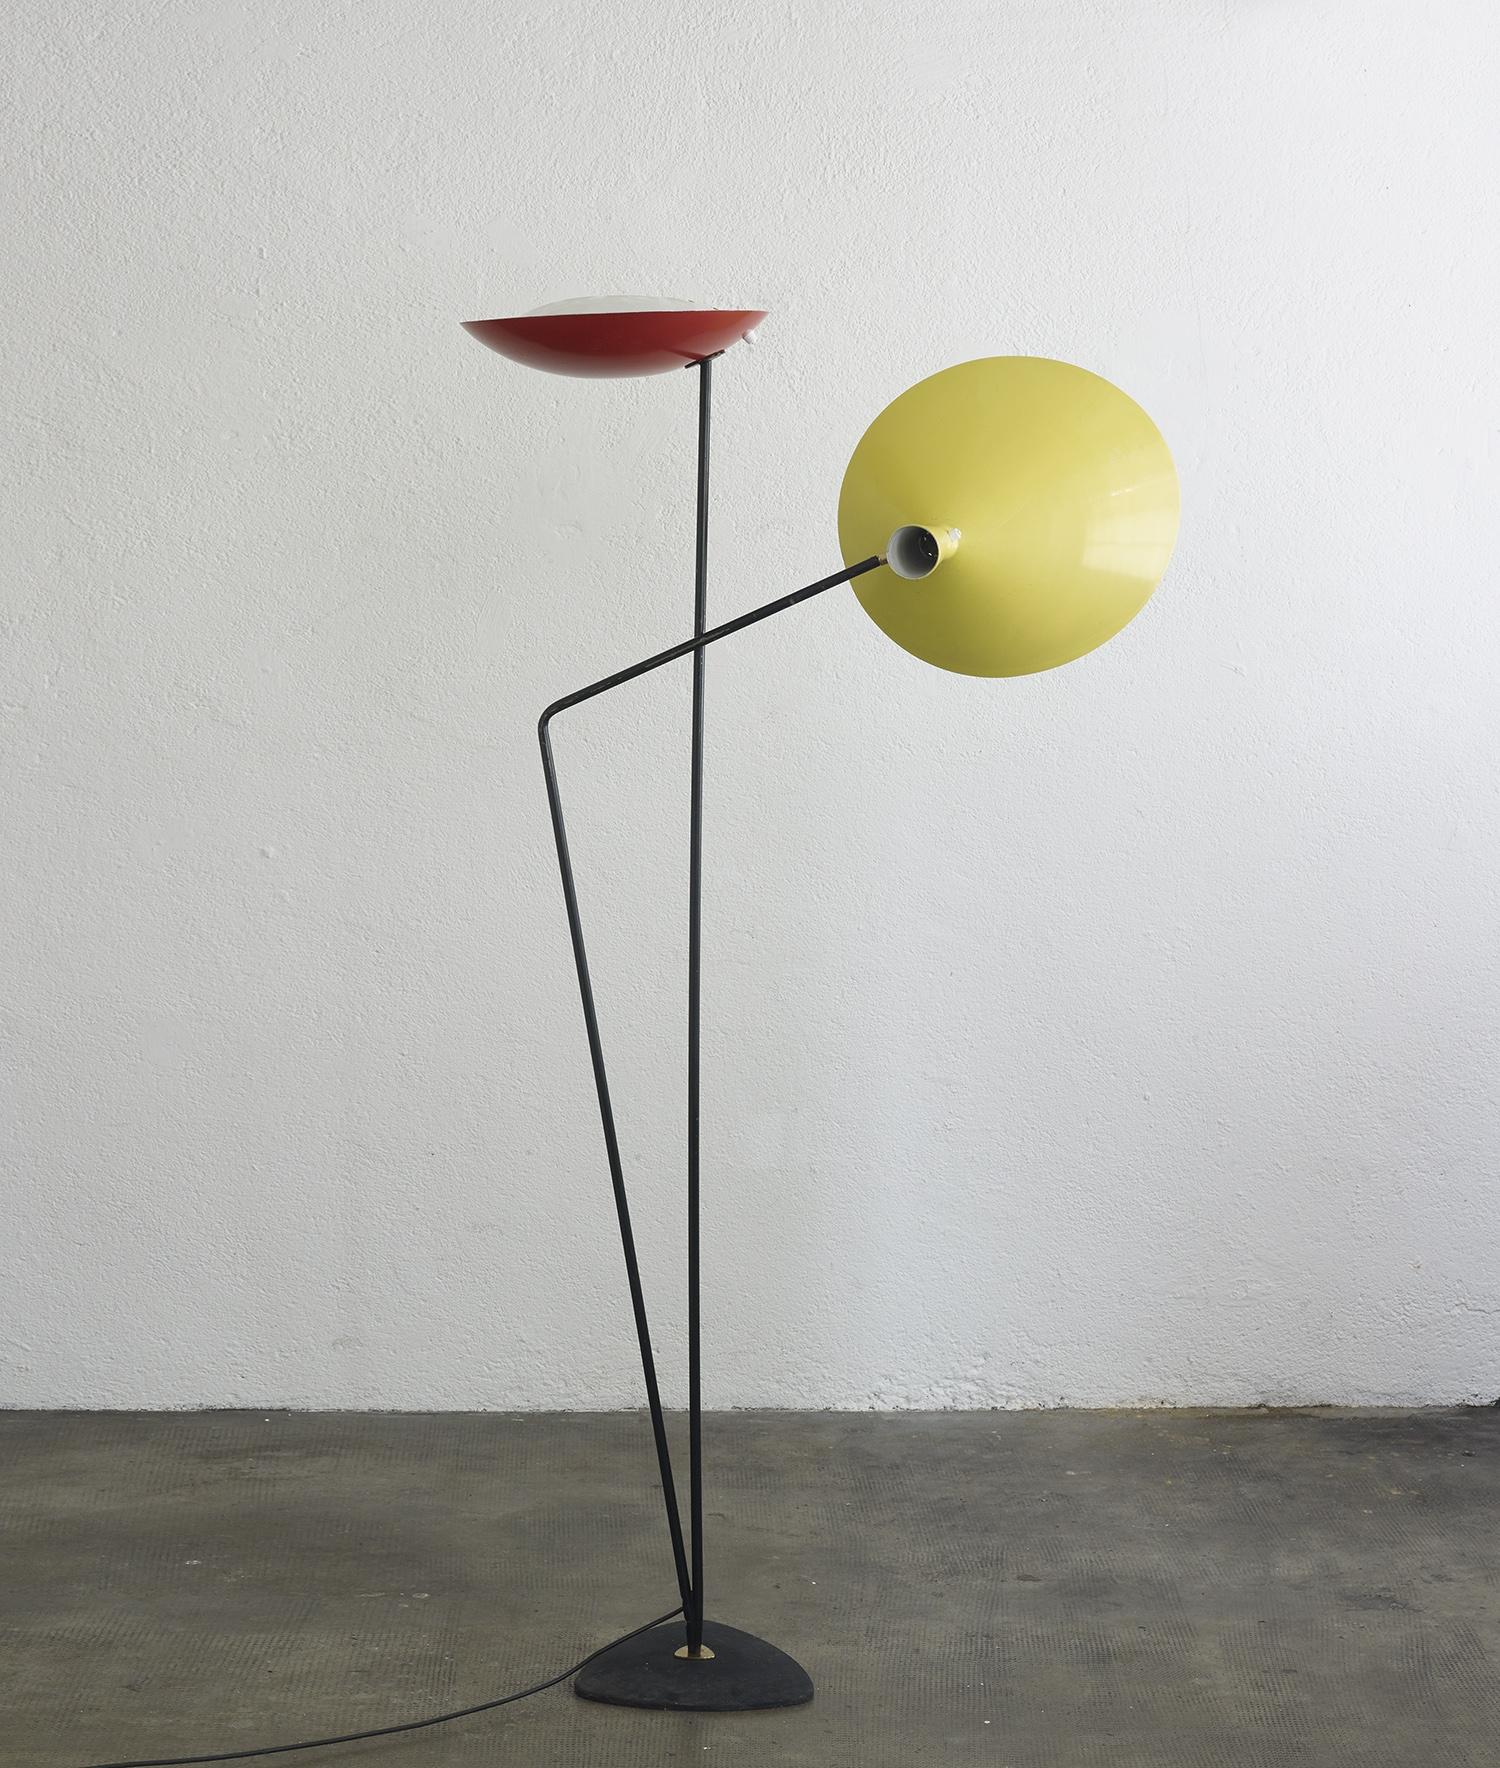 rare-lampe-de-sol-de-bag-turgi-1950-image-01